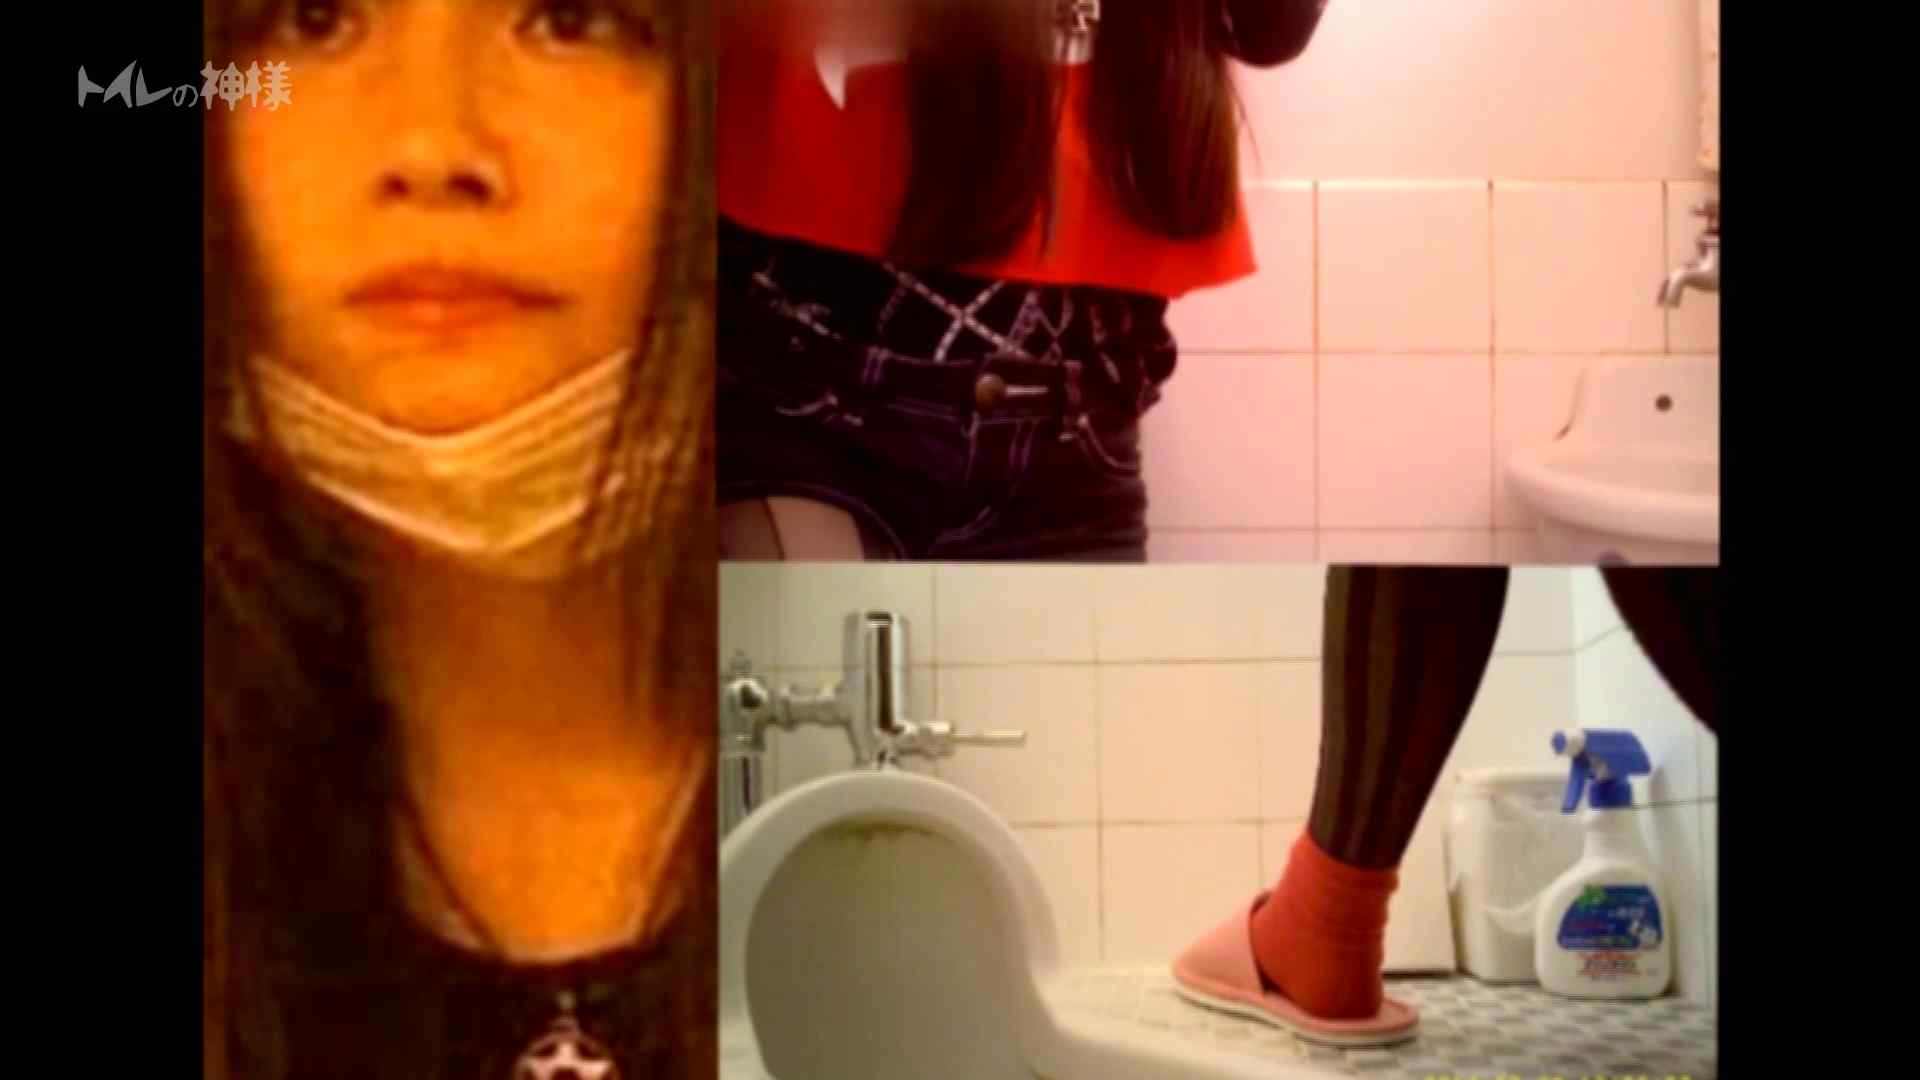 Vol.02 花の女子大生うんこ盗撮2 トイレの実態 盗撮動画紹介 108PIX 98